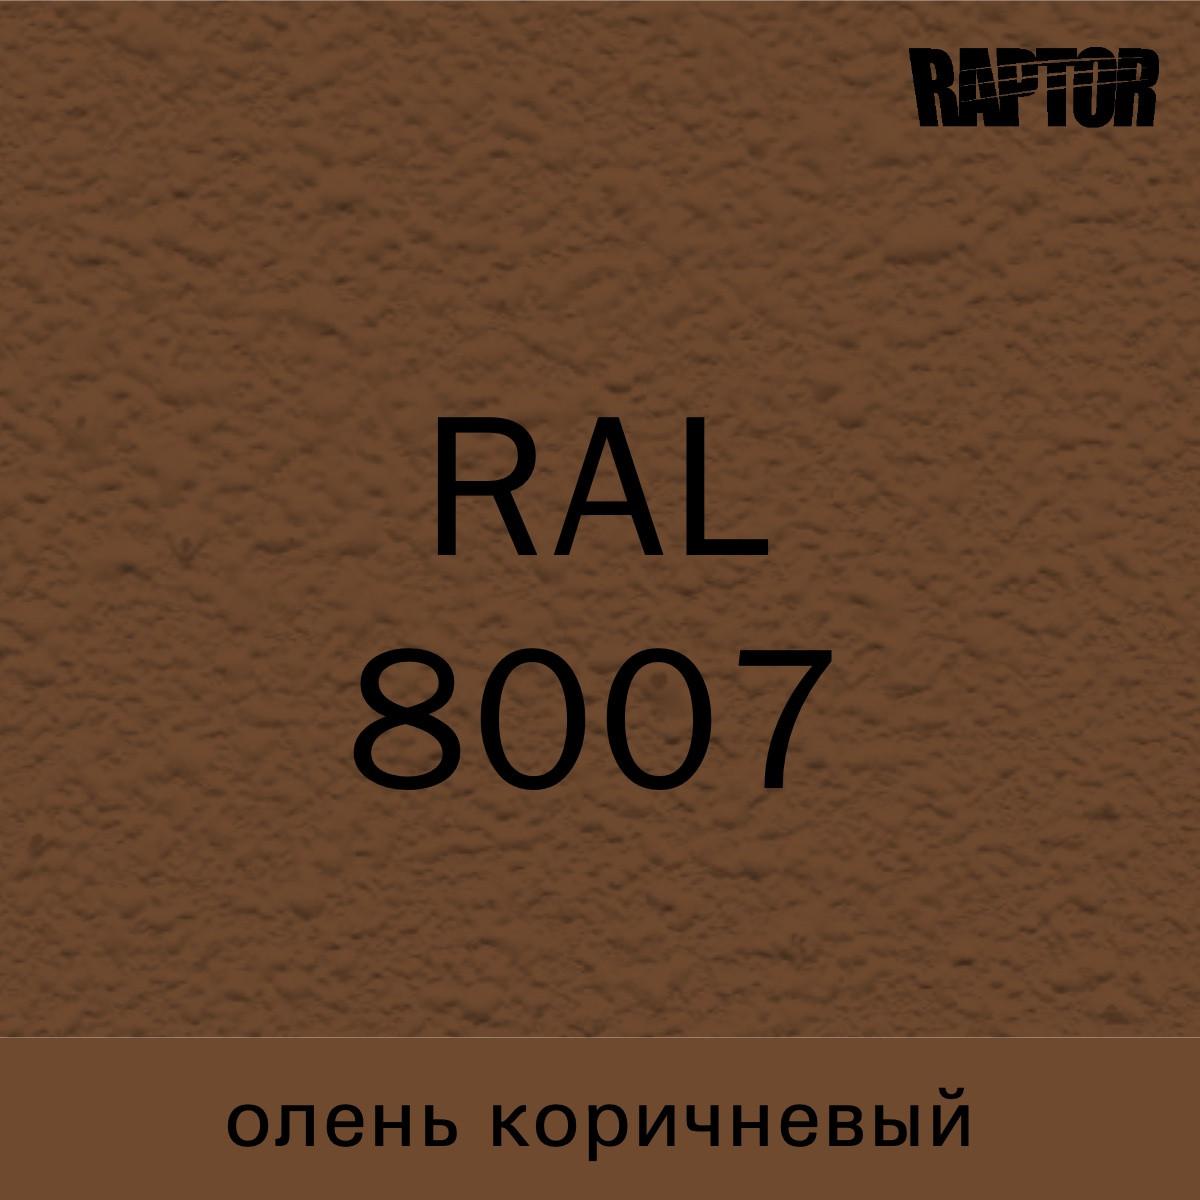 Пігмент для колеровки покриття RAPTOR™ Олень коричневий (RAL 8007)